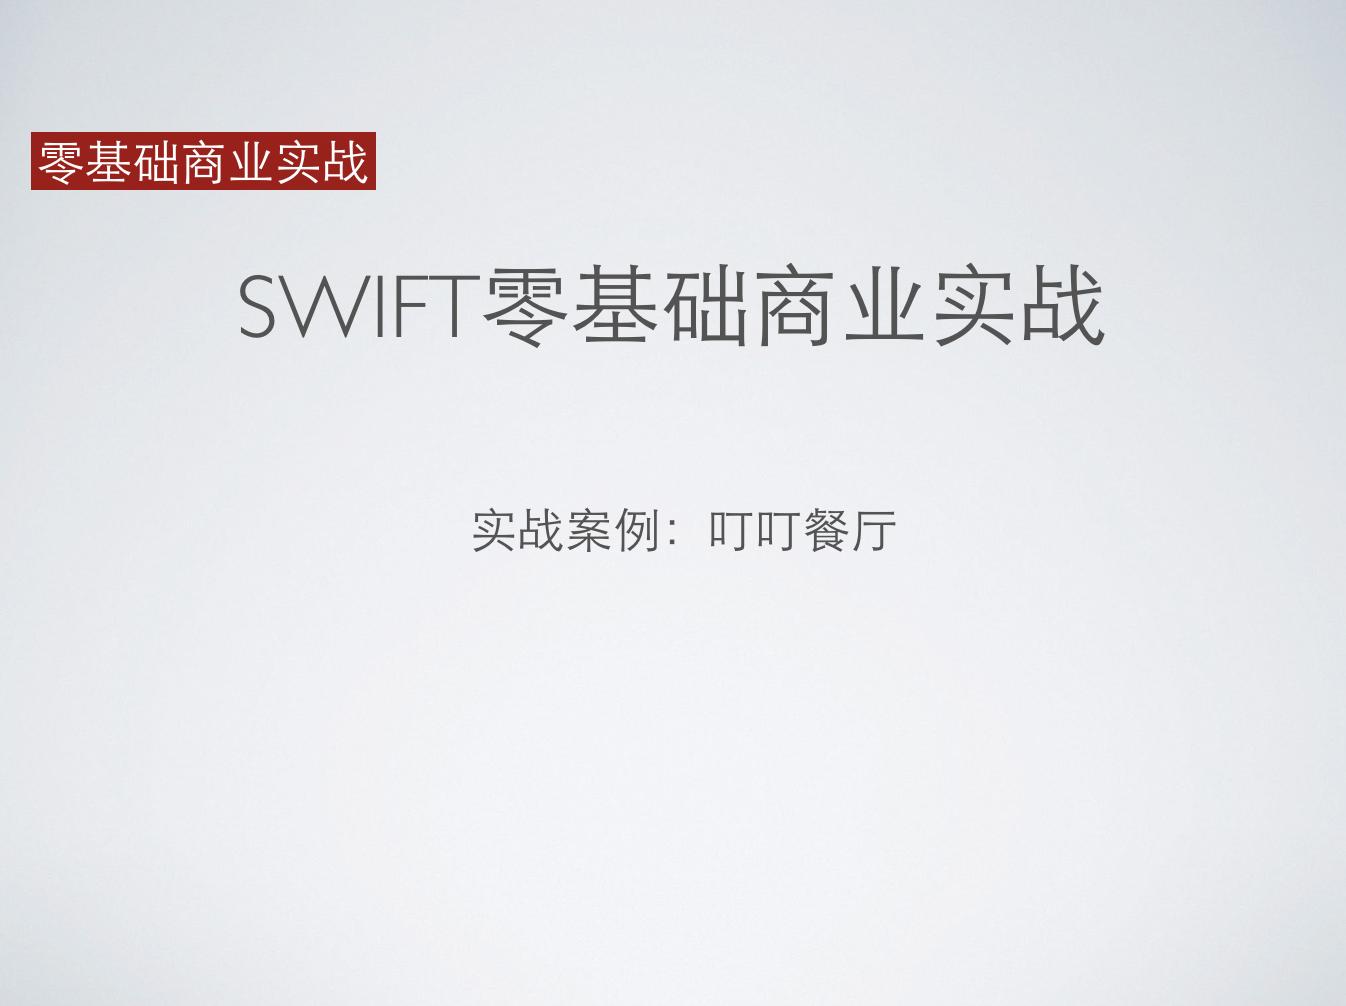 iOS8零基础商业实战基于Swift-Xcode7视频课程